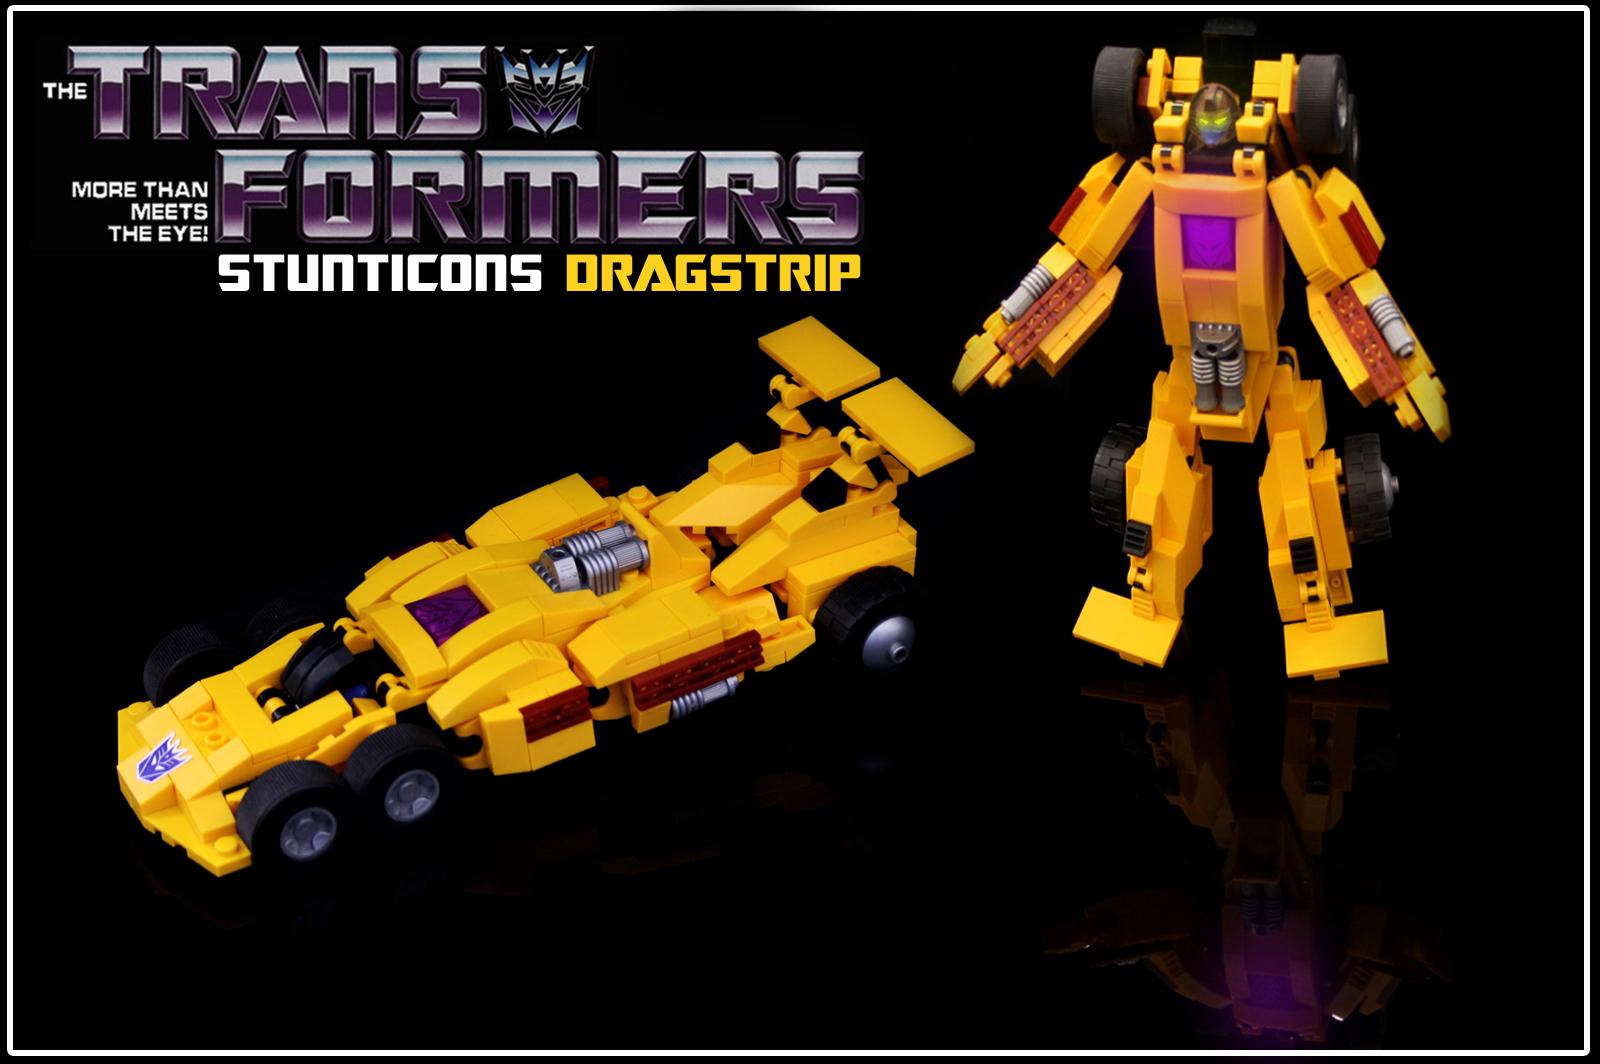 Kre O Transformers G1 Rolling Thunder By Alexander Jones AKA OrionPax